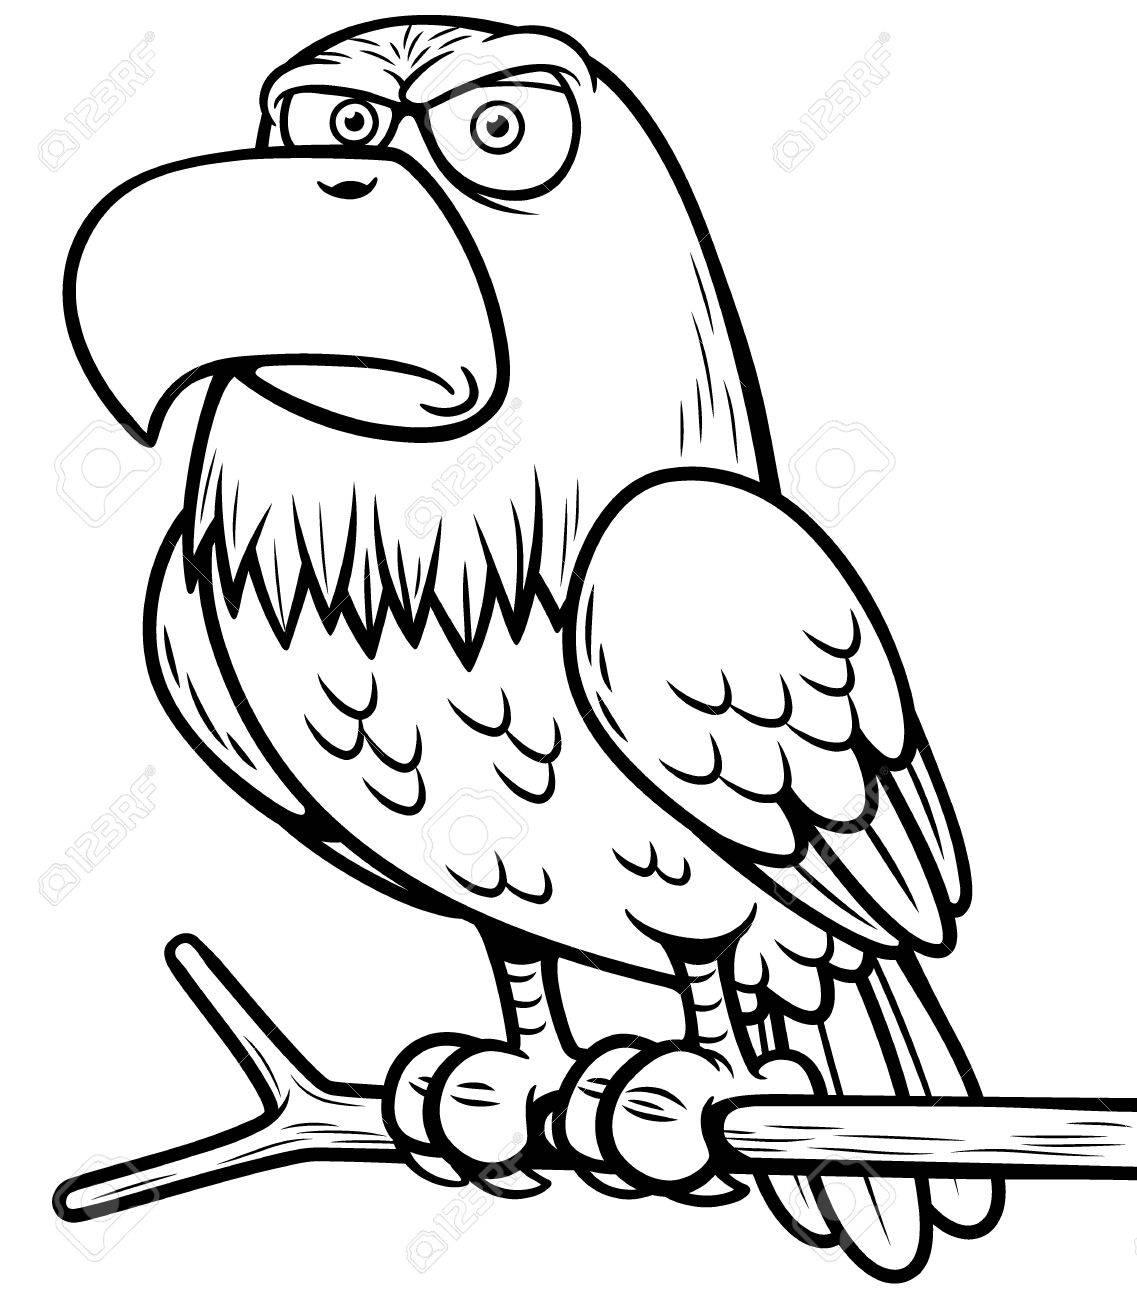 1137x1300 Illustration Of Cartoon Eagle